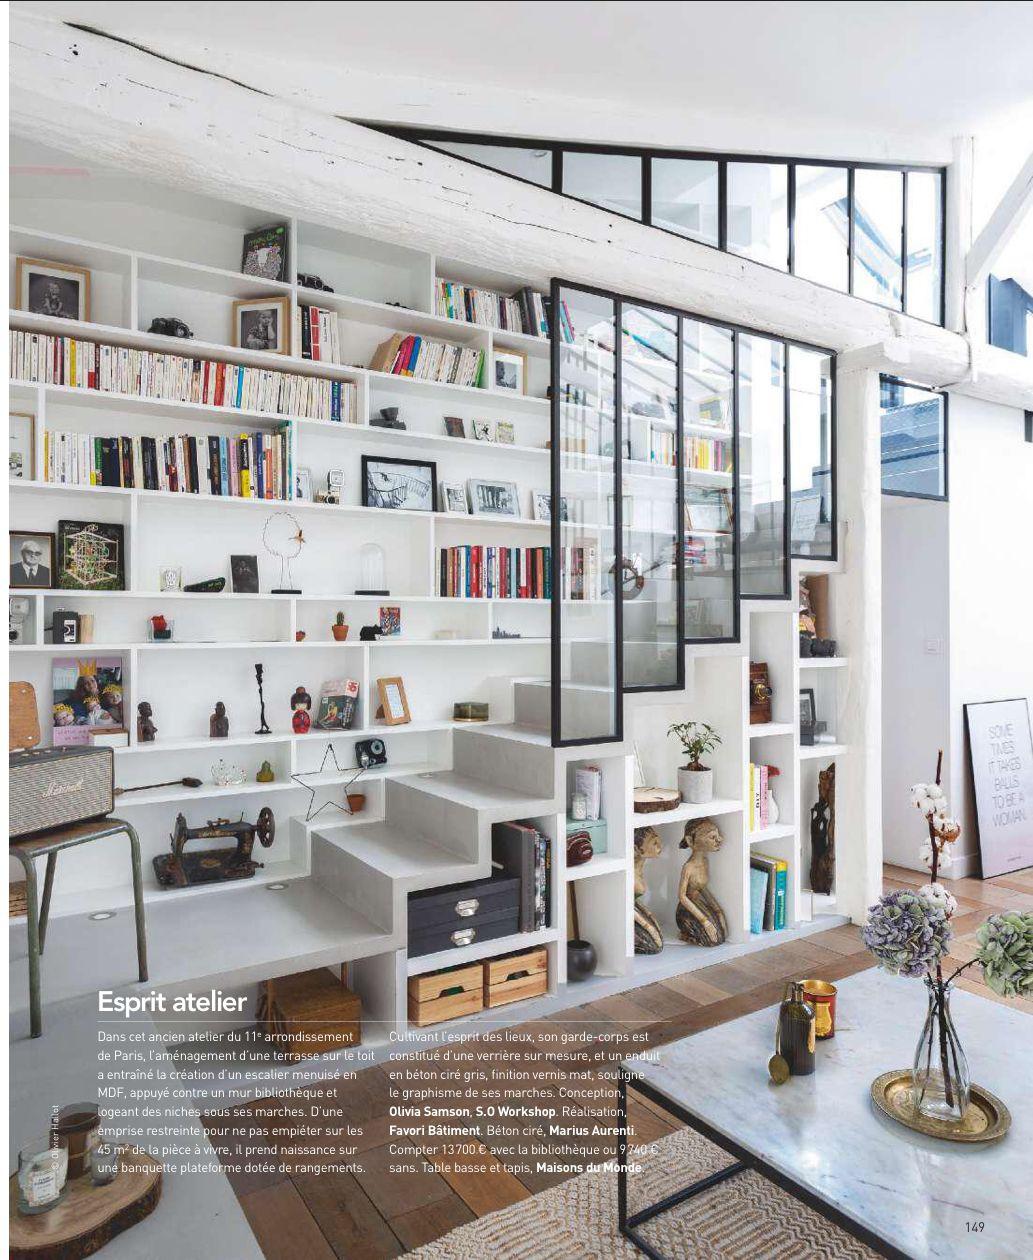 Escalier esprit atelier | Kirk home in 2019 | Home decor, Home, House